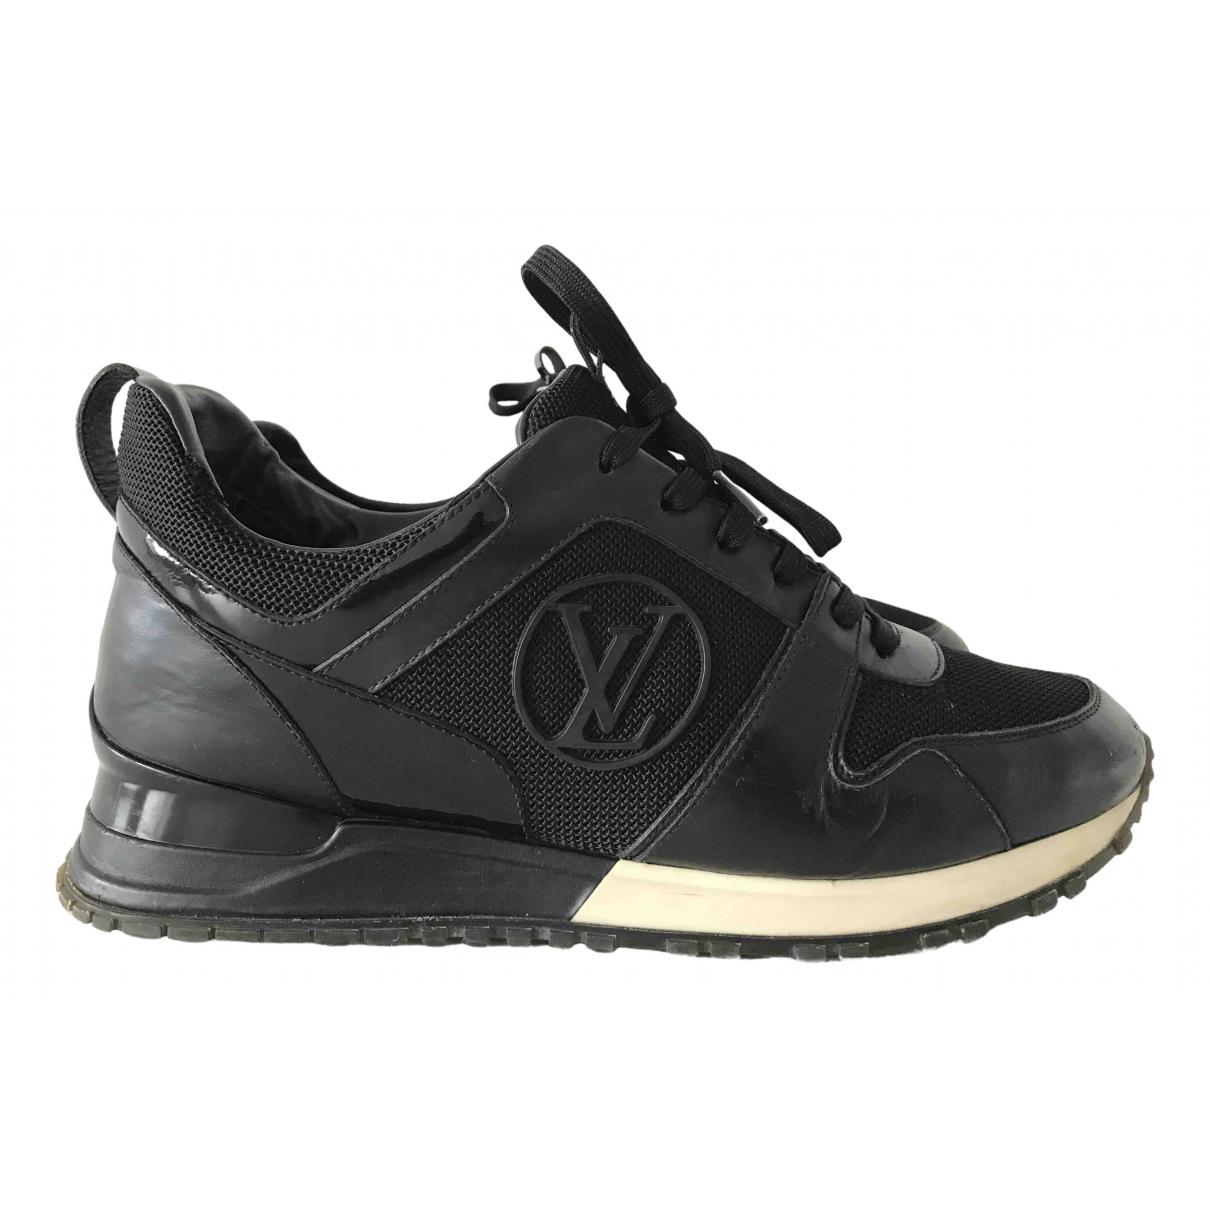 Louis Vuitton - Baskets Run Away pour femme en cuir - noir